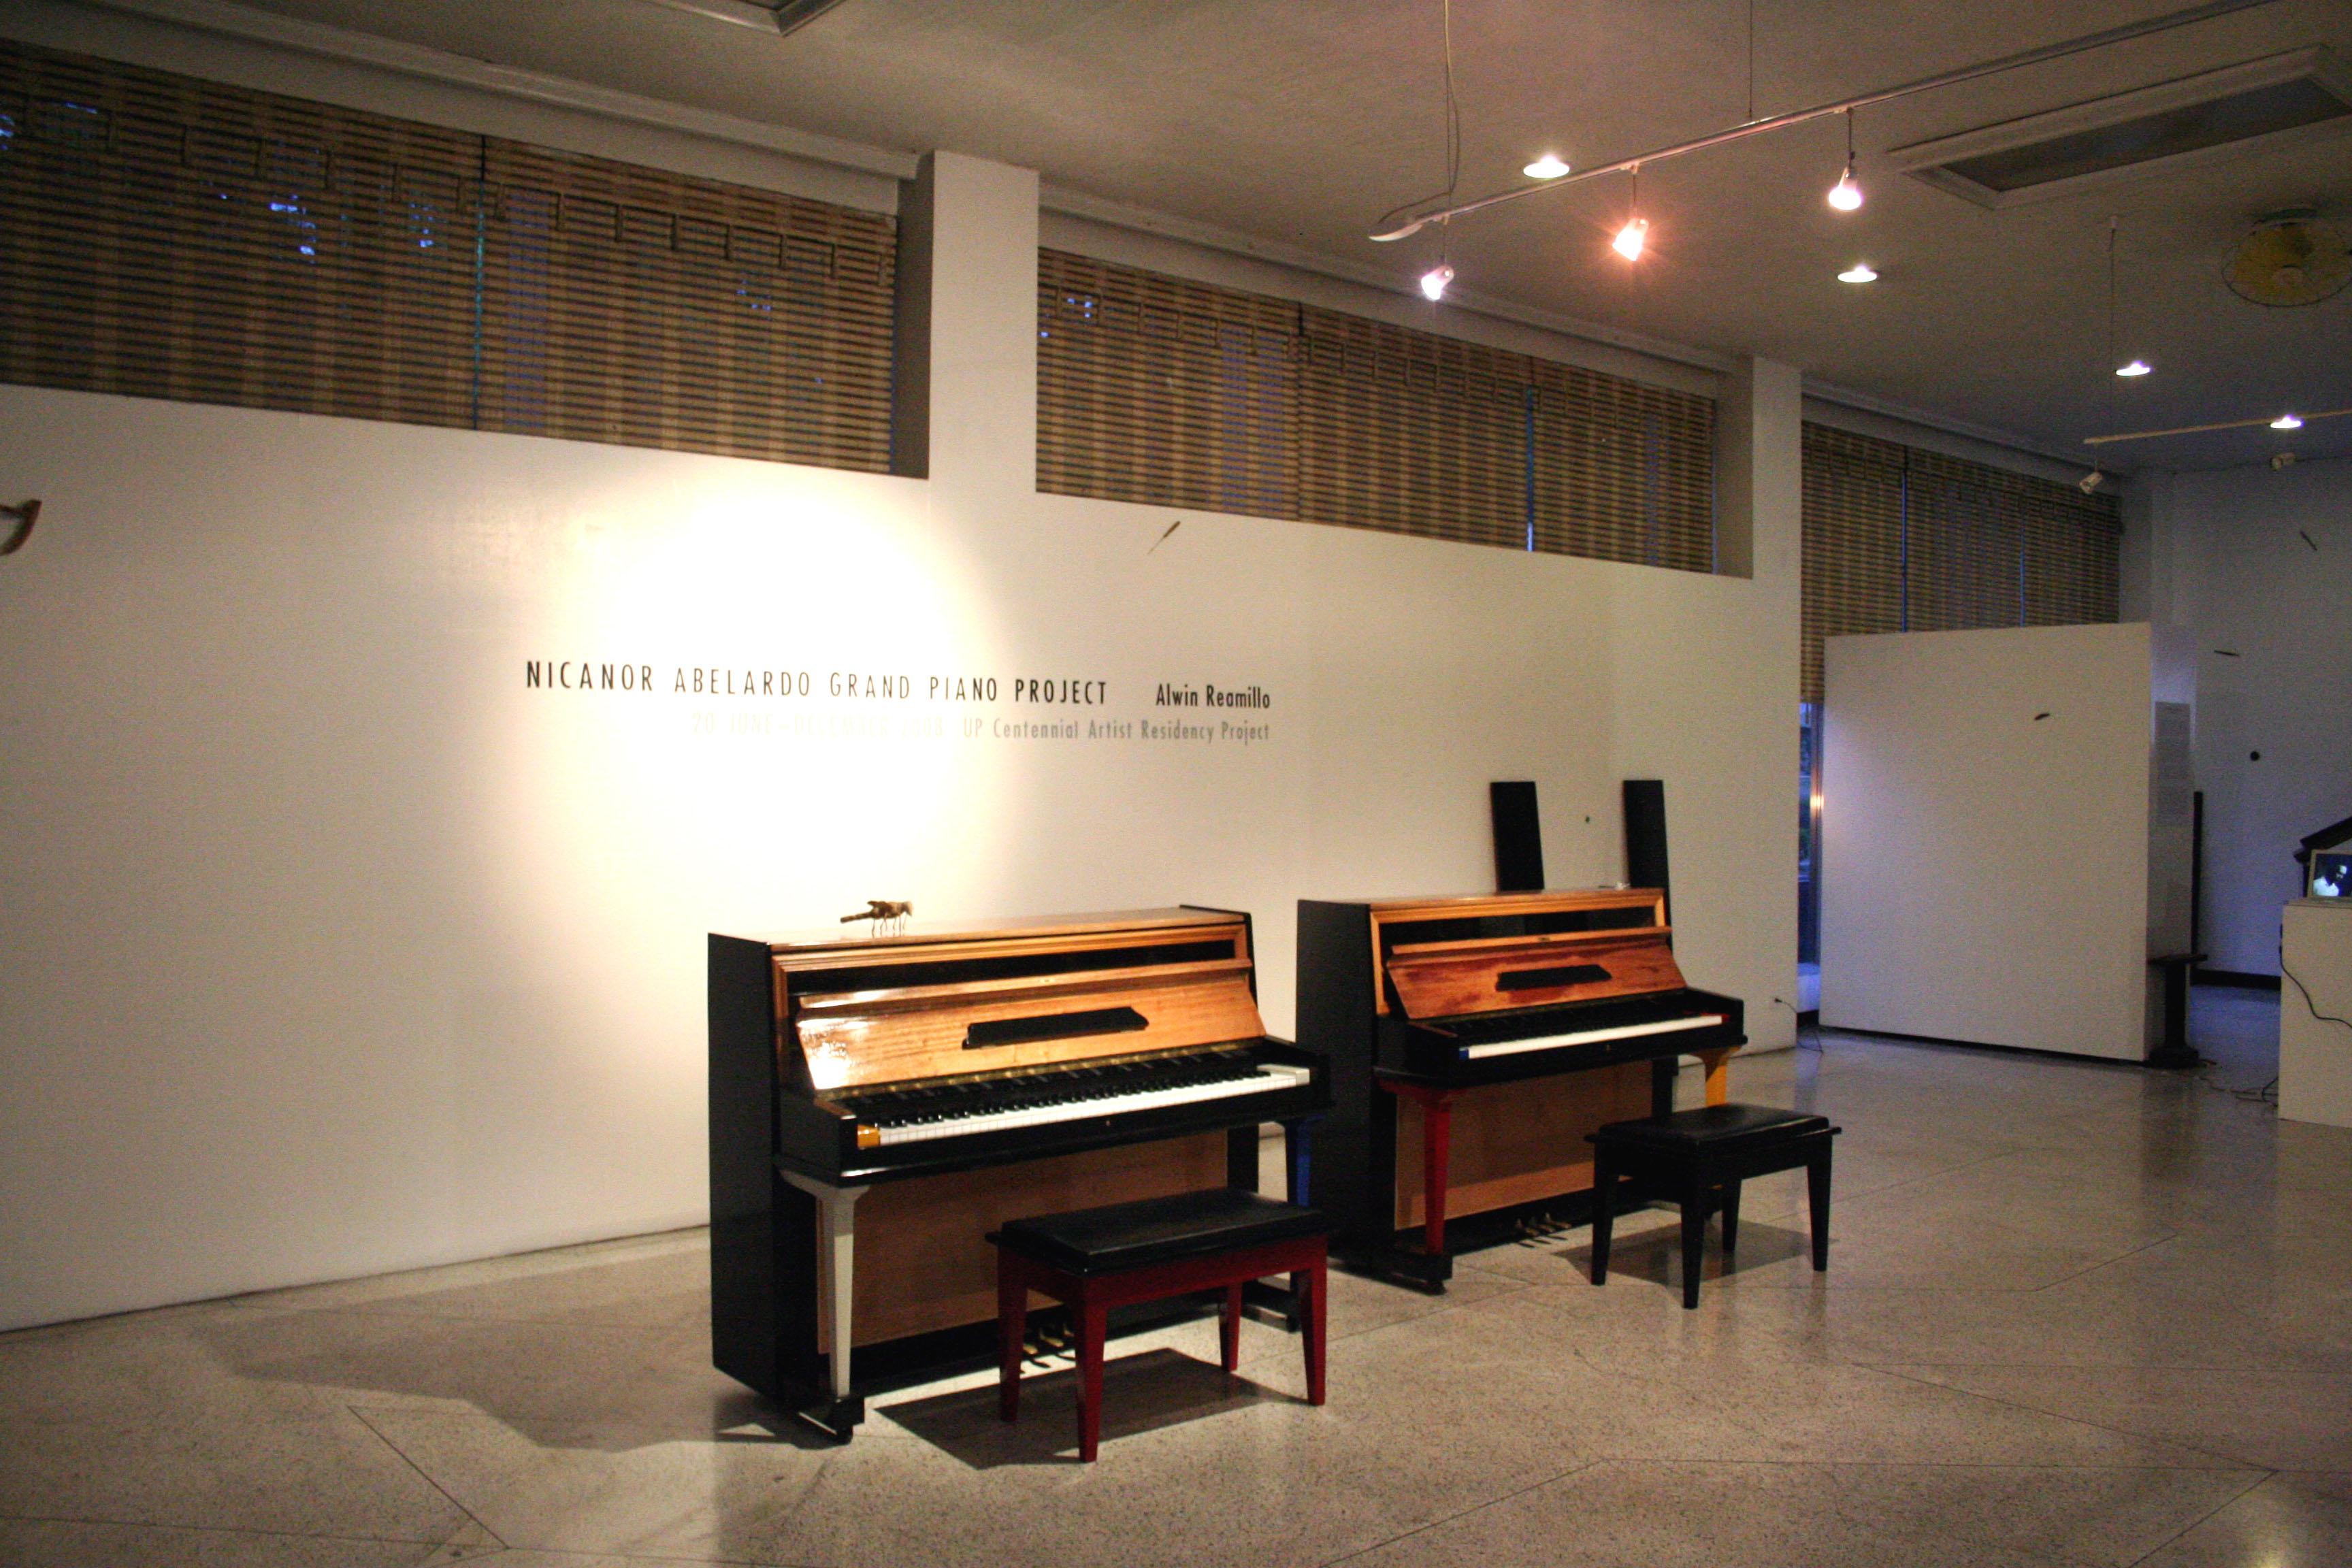 Nicanor Abelardo Grand Piano Project Exhibit Opening